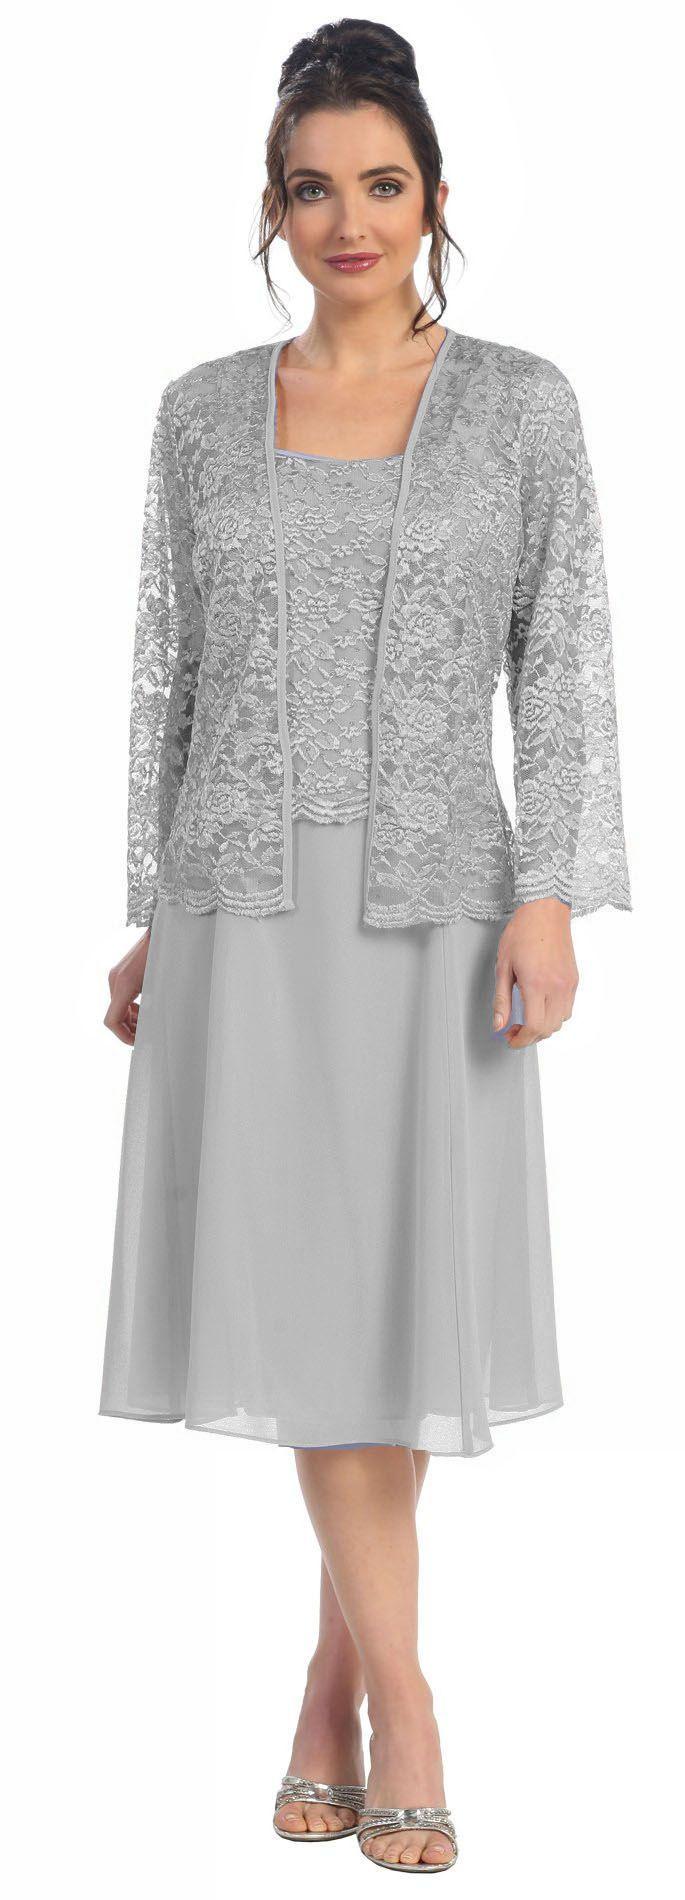 T-length lace wedding dresses november 2018  best whau dresses images on Pinterest  Classy dress Low cut